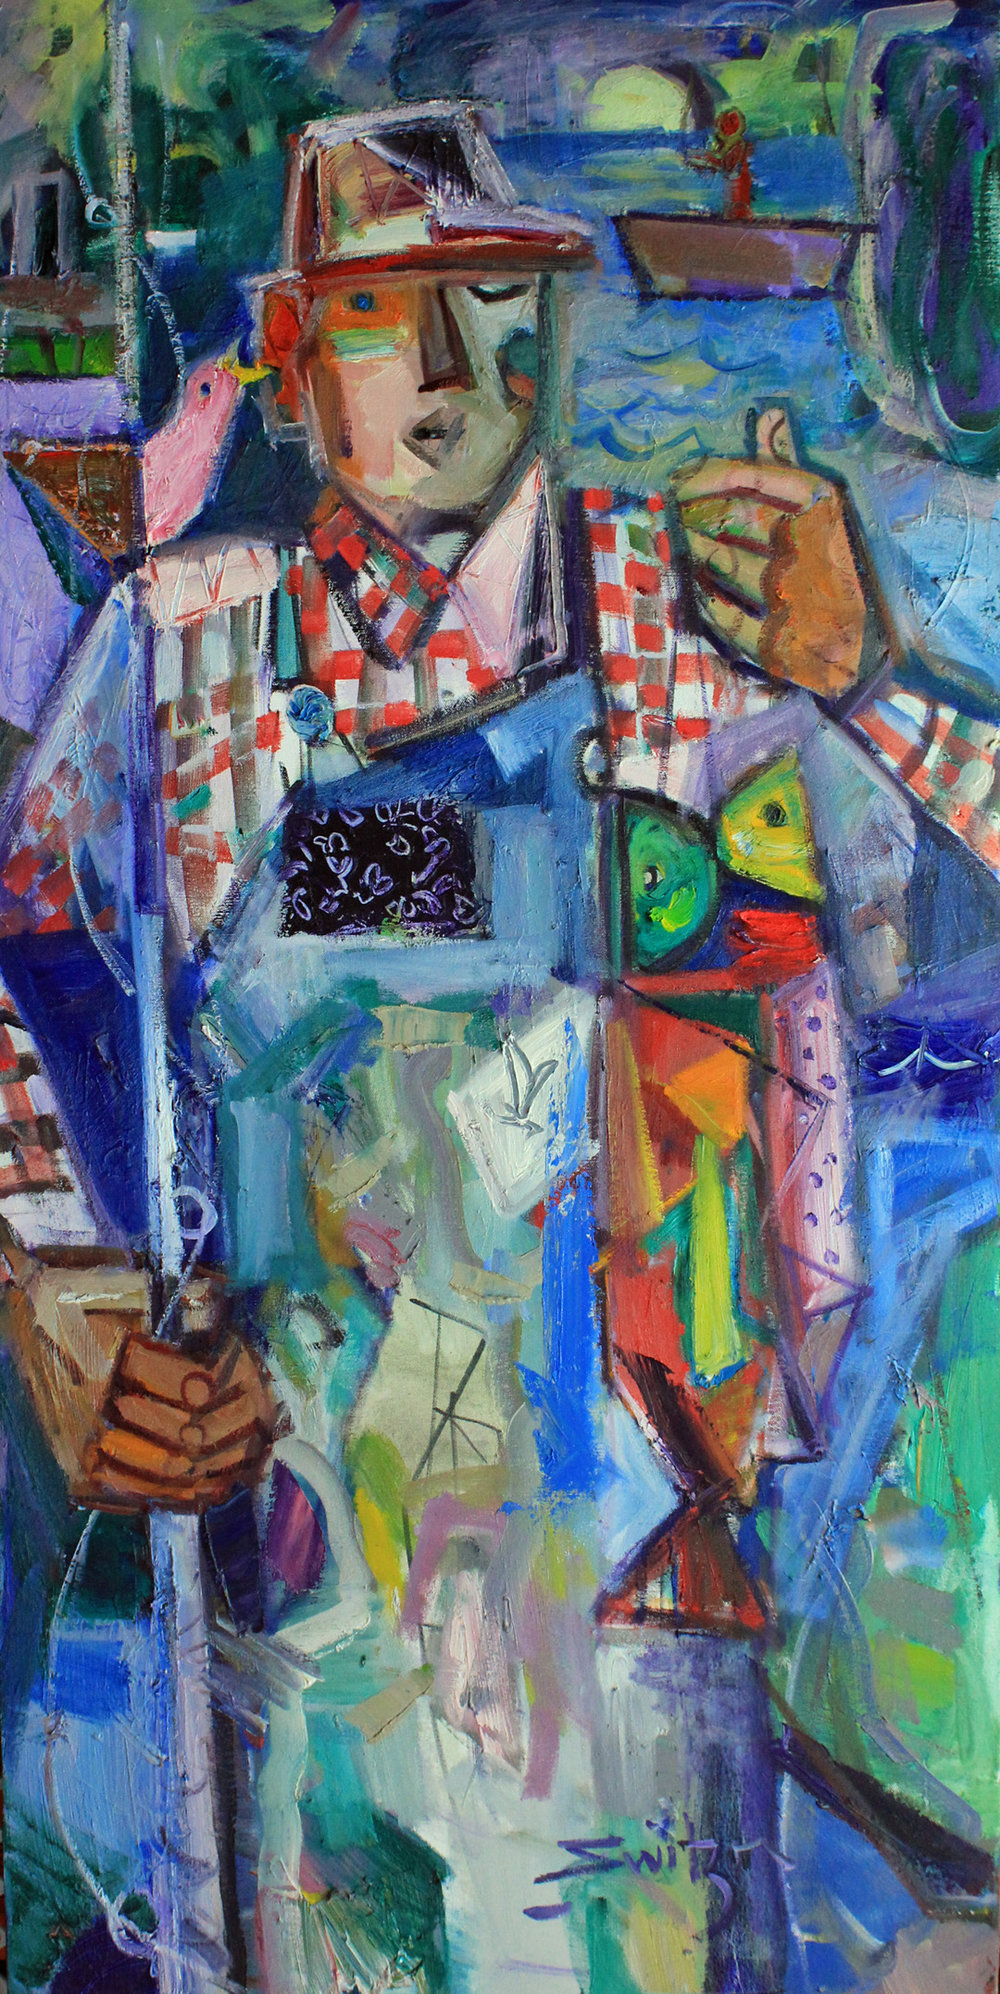 """Dream Fish"", 48x24 inches, oil on canvas"